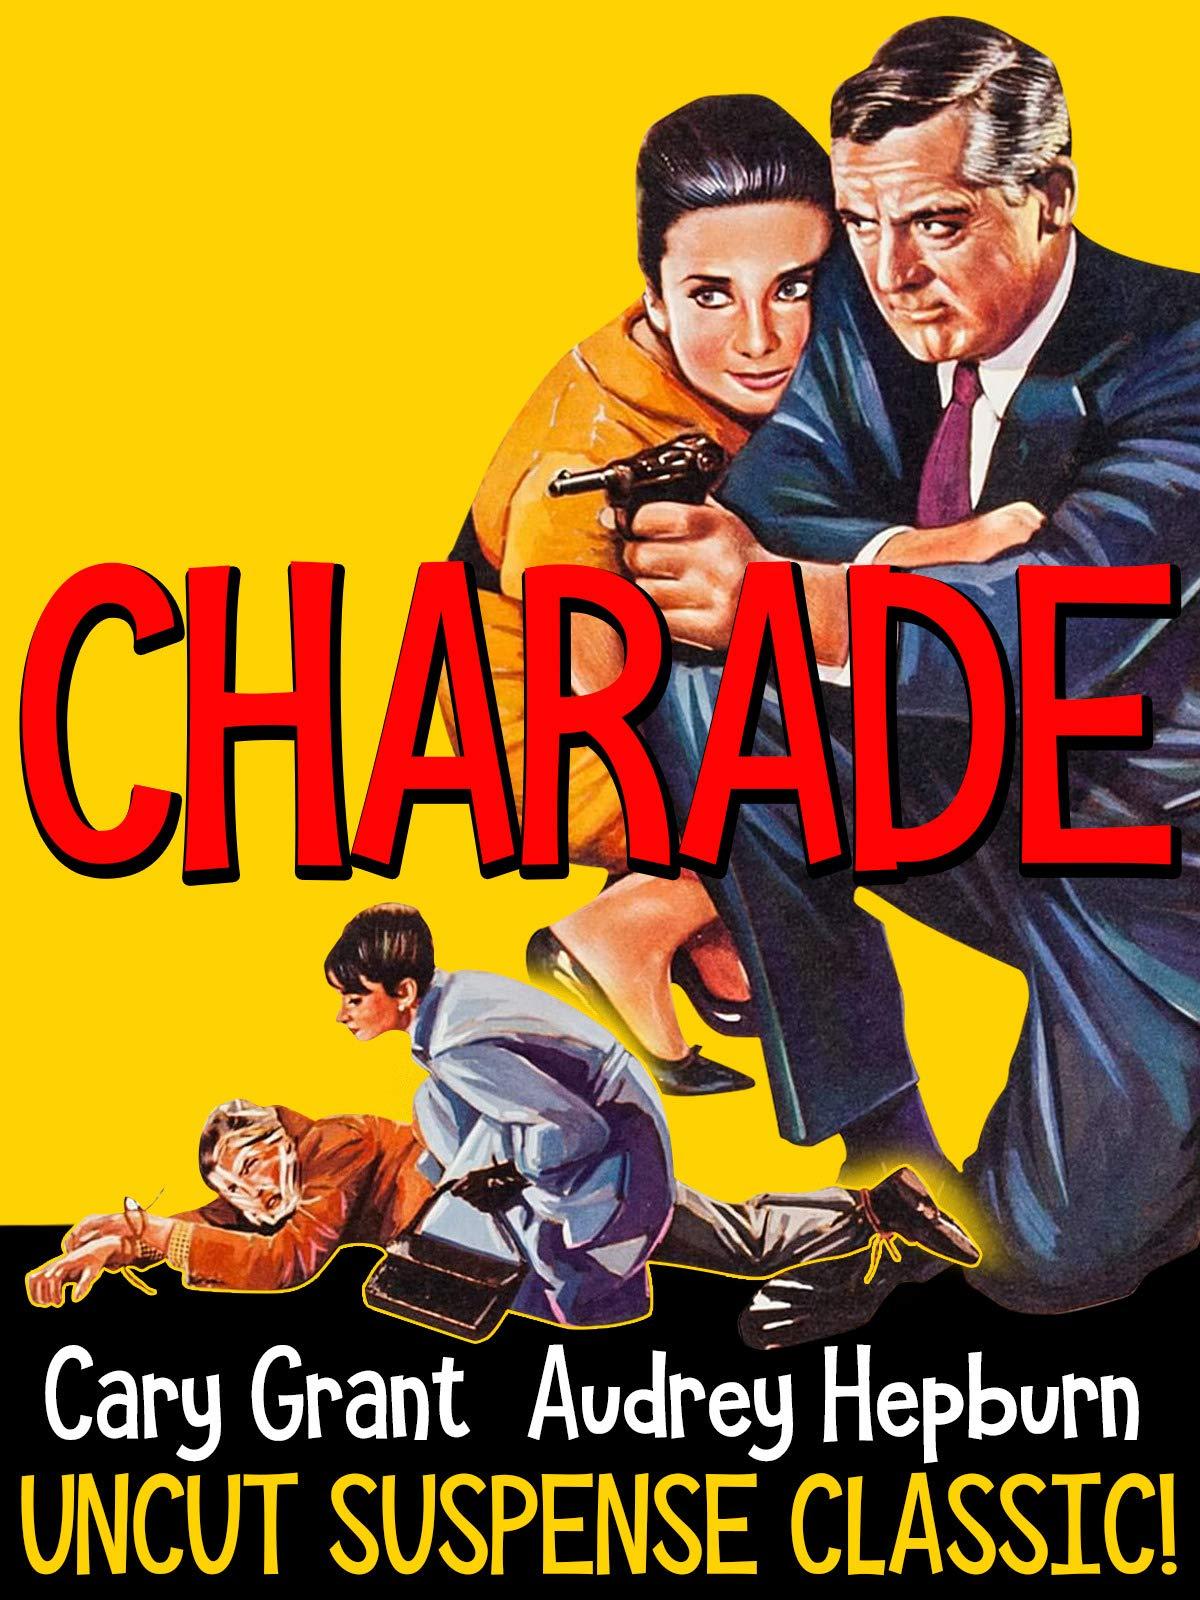 Charade Audrey Hepburn Suspense Classic